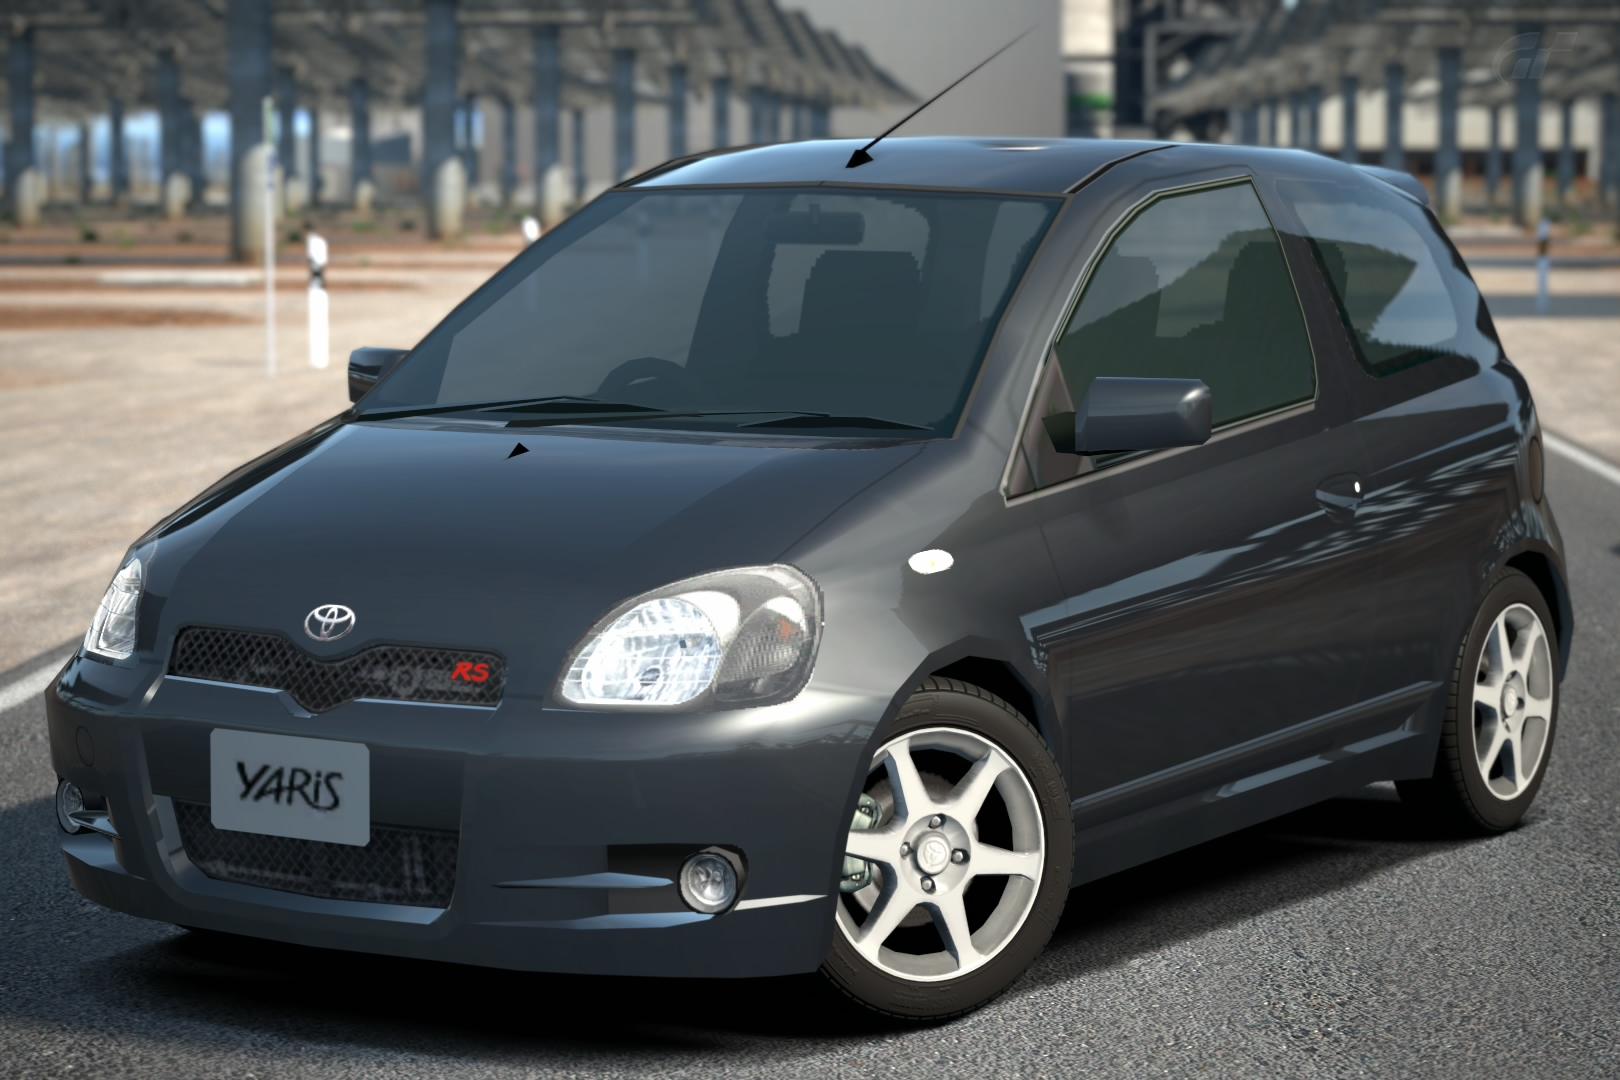 Kelebihan Kekurangan Toyota Yaris Rs Review